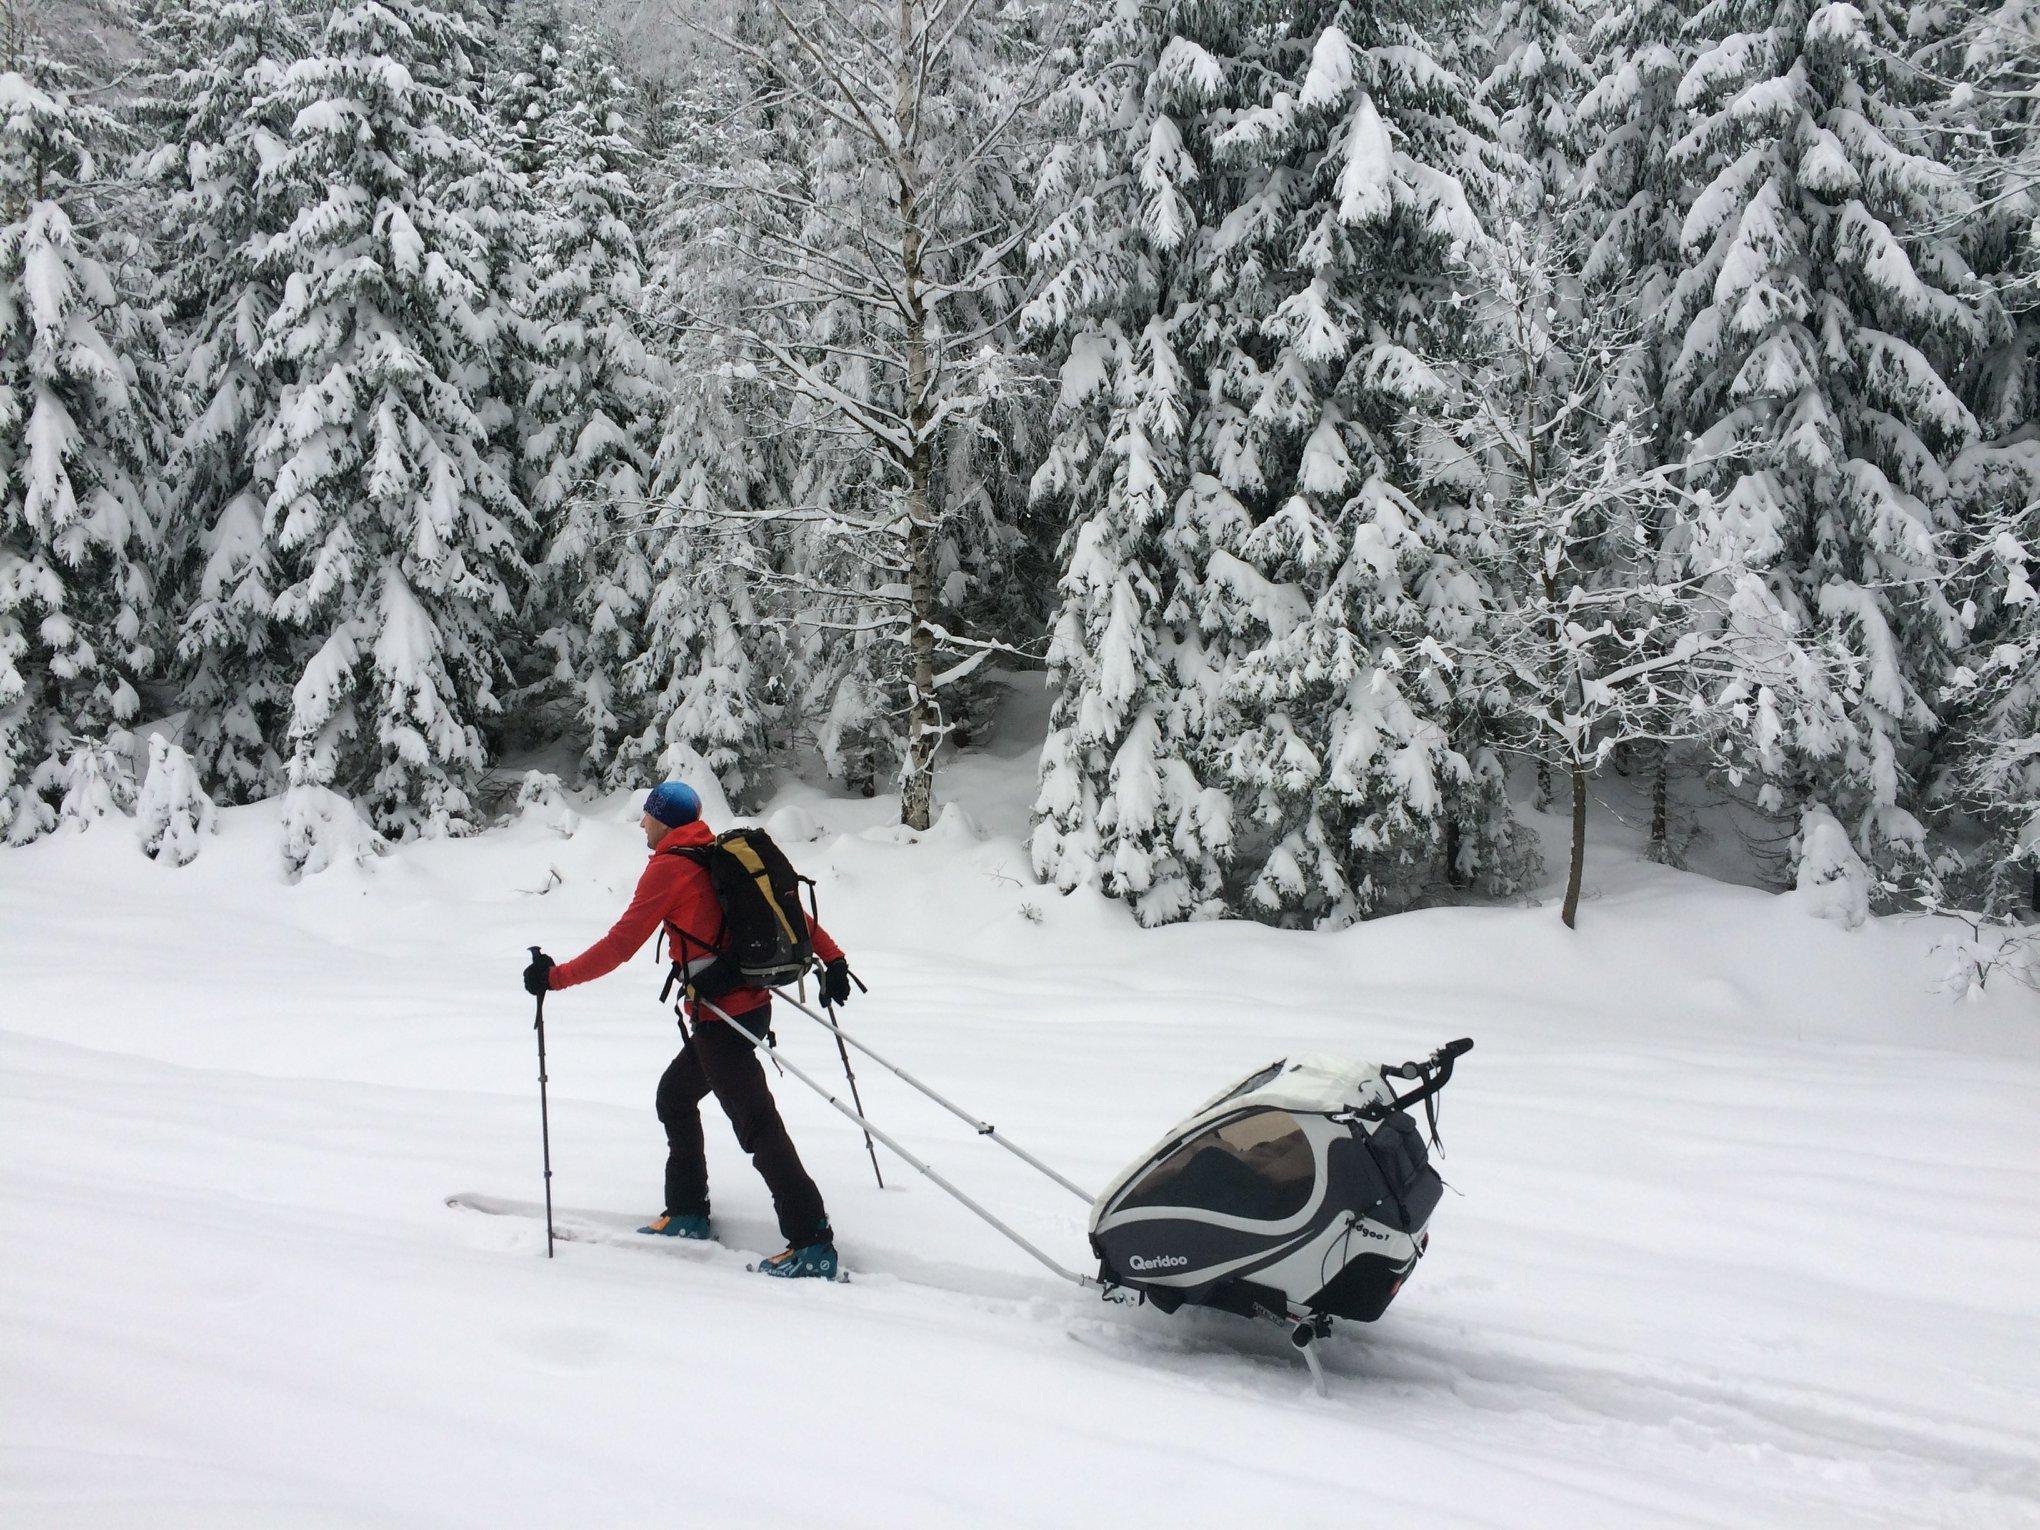 KidGoo Qeridoo vozík se ski setem, bike.sk